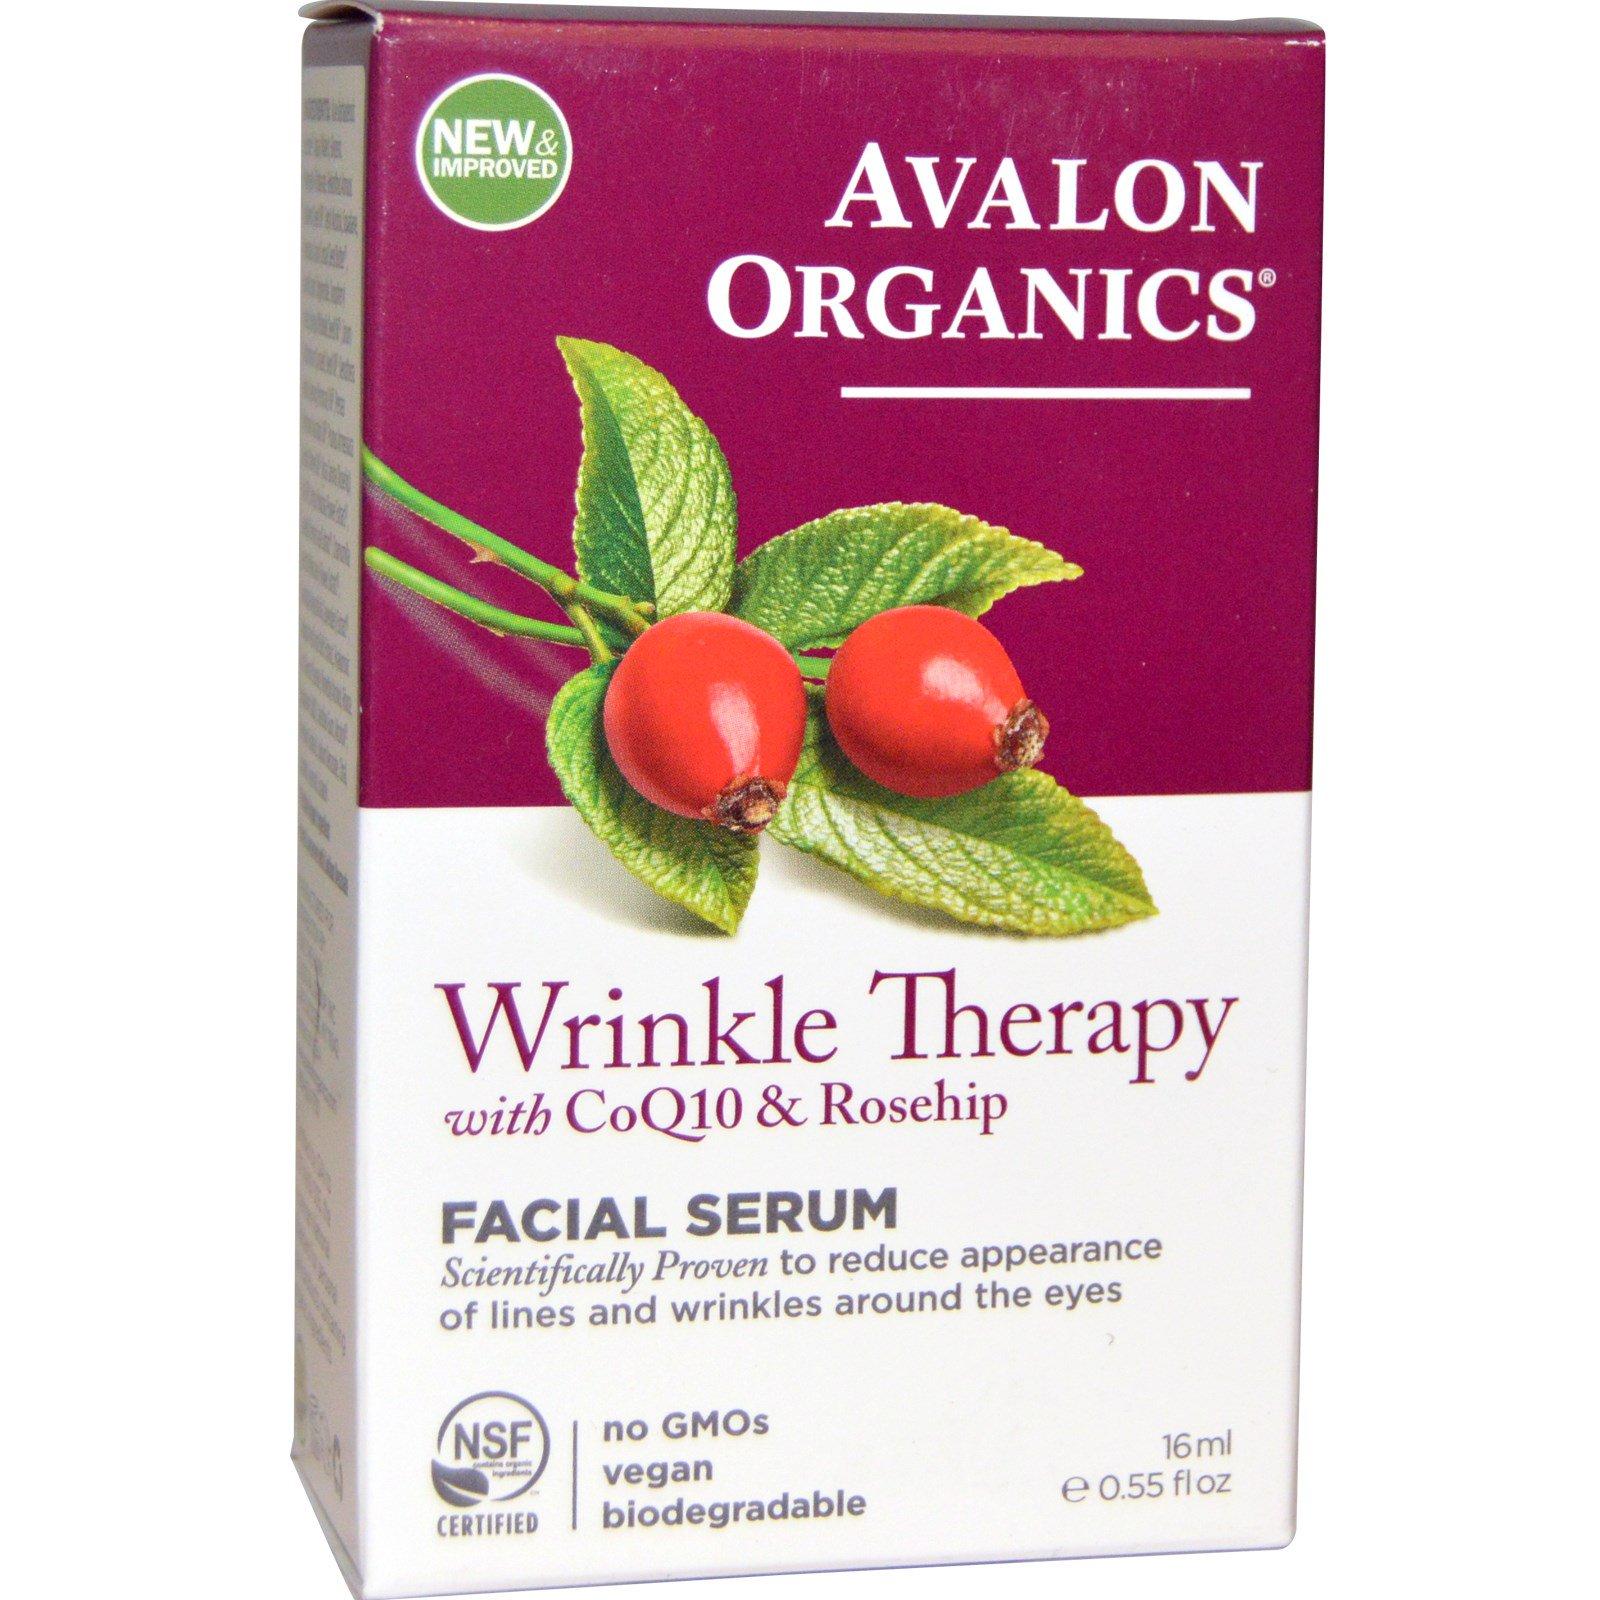 Avalon Organics, CoQ10 Repair, Сыворотка против морщин, 55 жидких унций (16 мл)